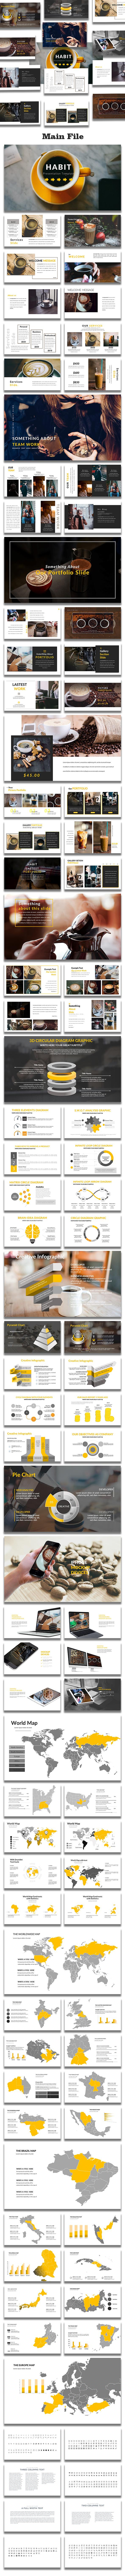 Habit - Creative Google Slide Template - Google Slides Presentation Templates